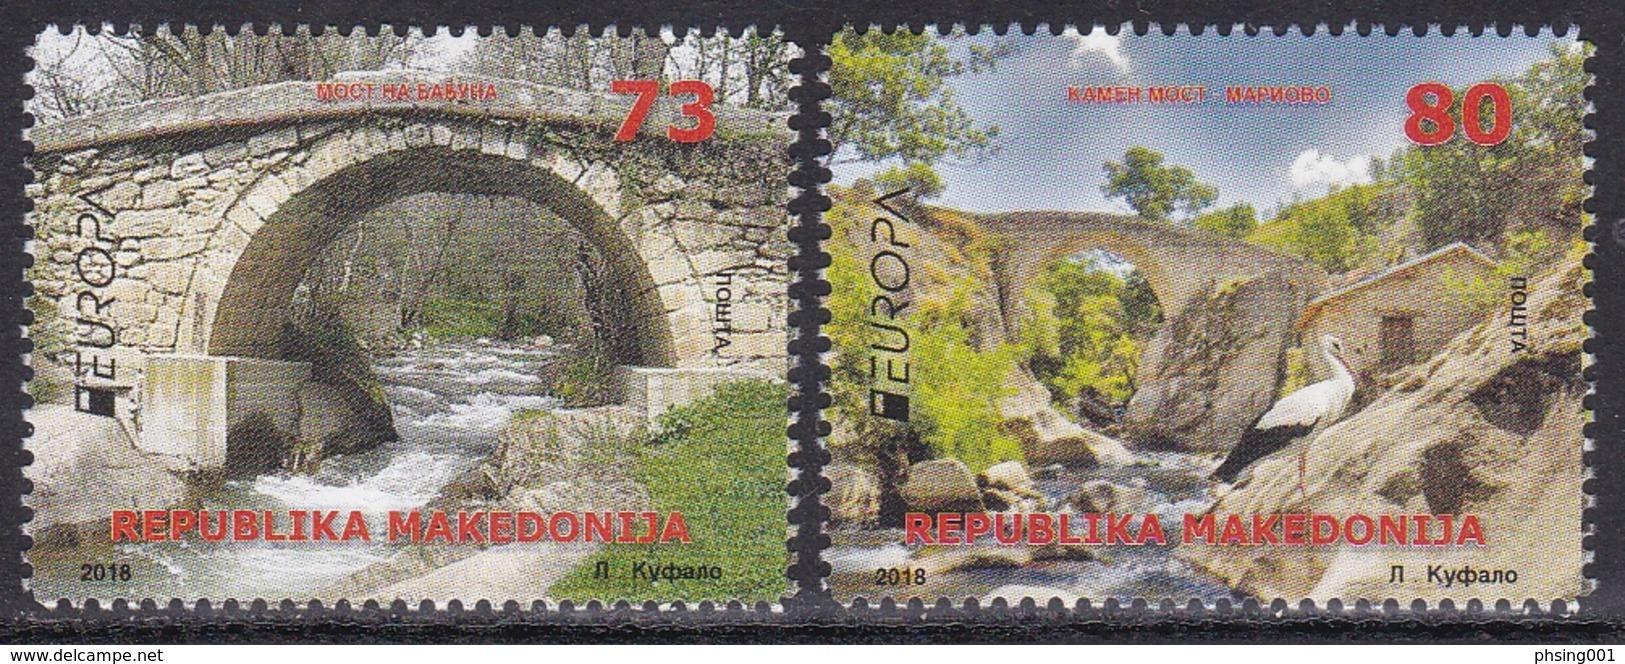 Macedonia 2018 Europa CEPT Bridges Bruecken Ponts, Architecture, Fauna, Birds, Stork, Set MNH - 2018